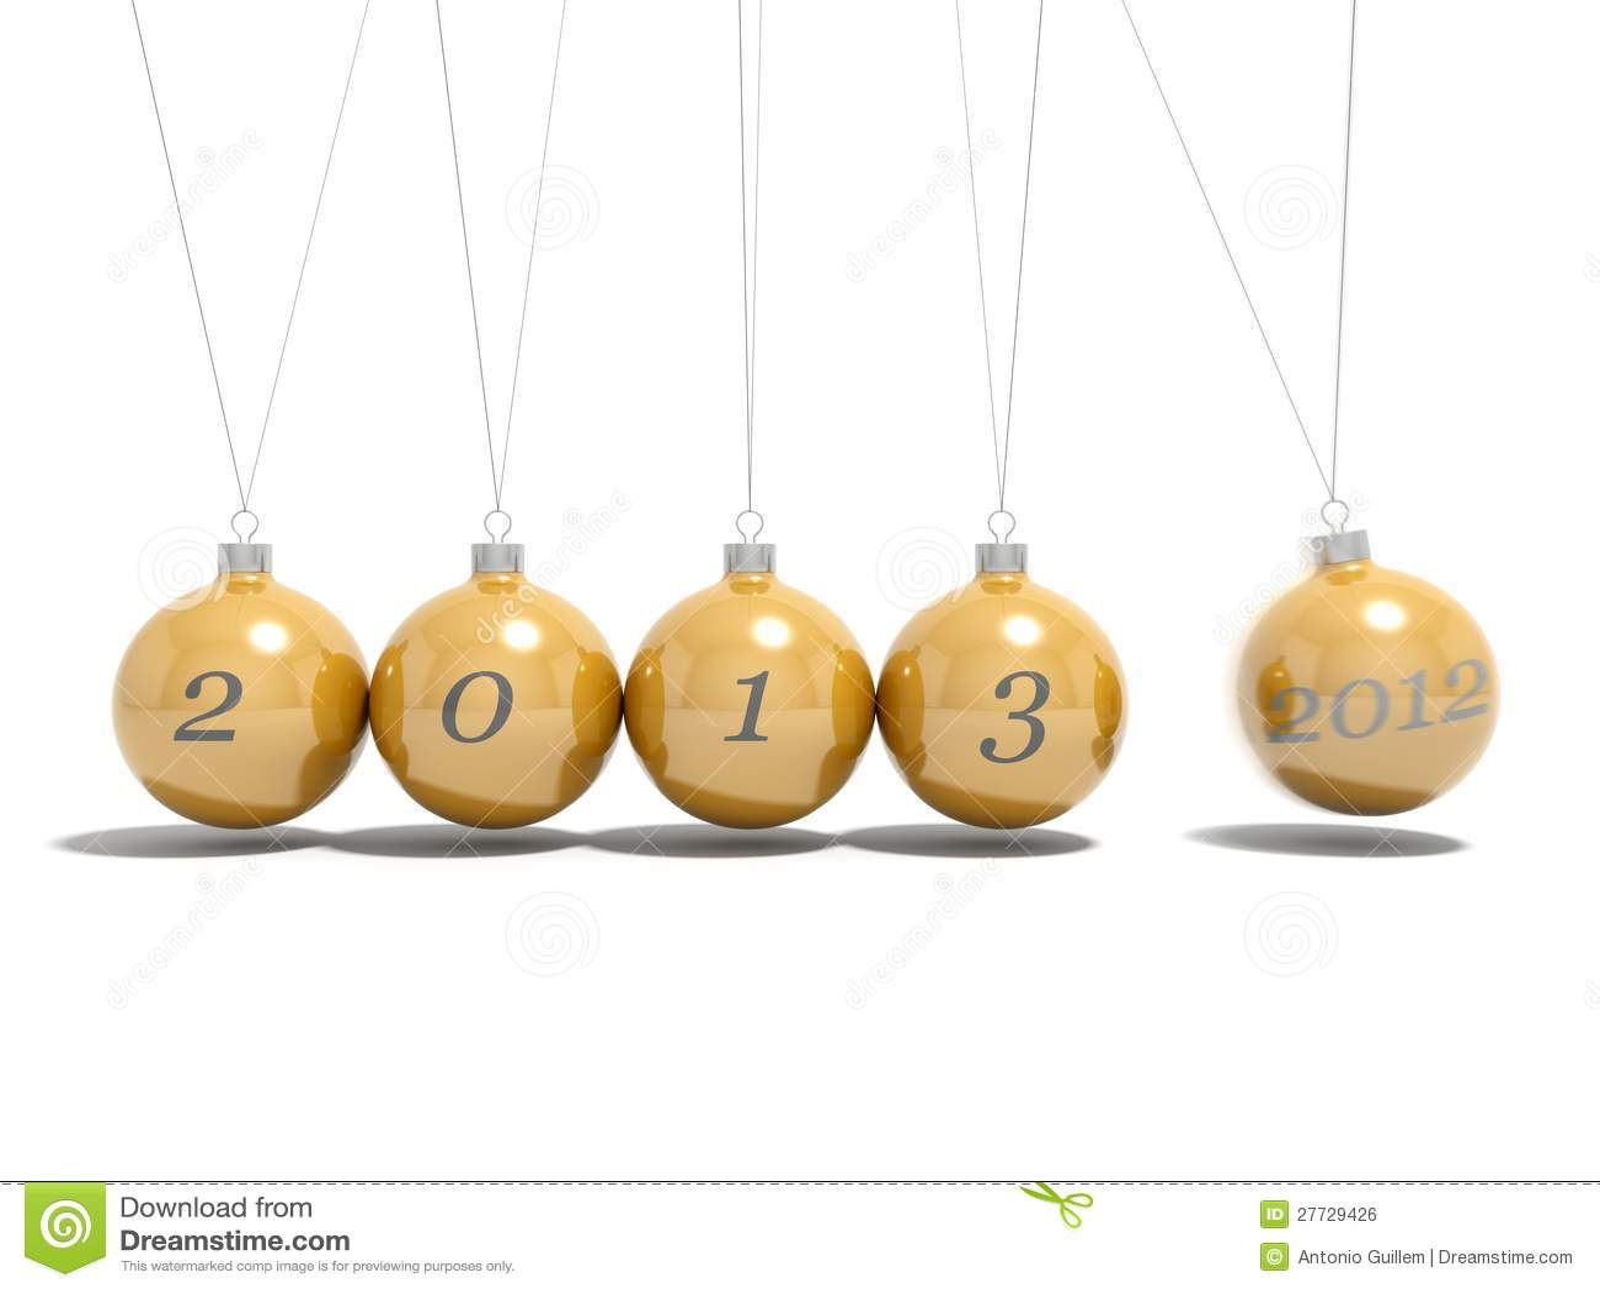 Weihnachtskugel-Silvesterabend 2012 - 2013